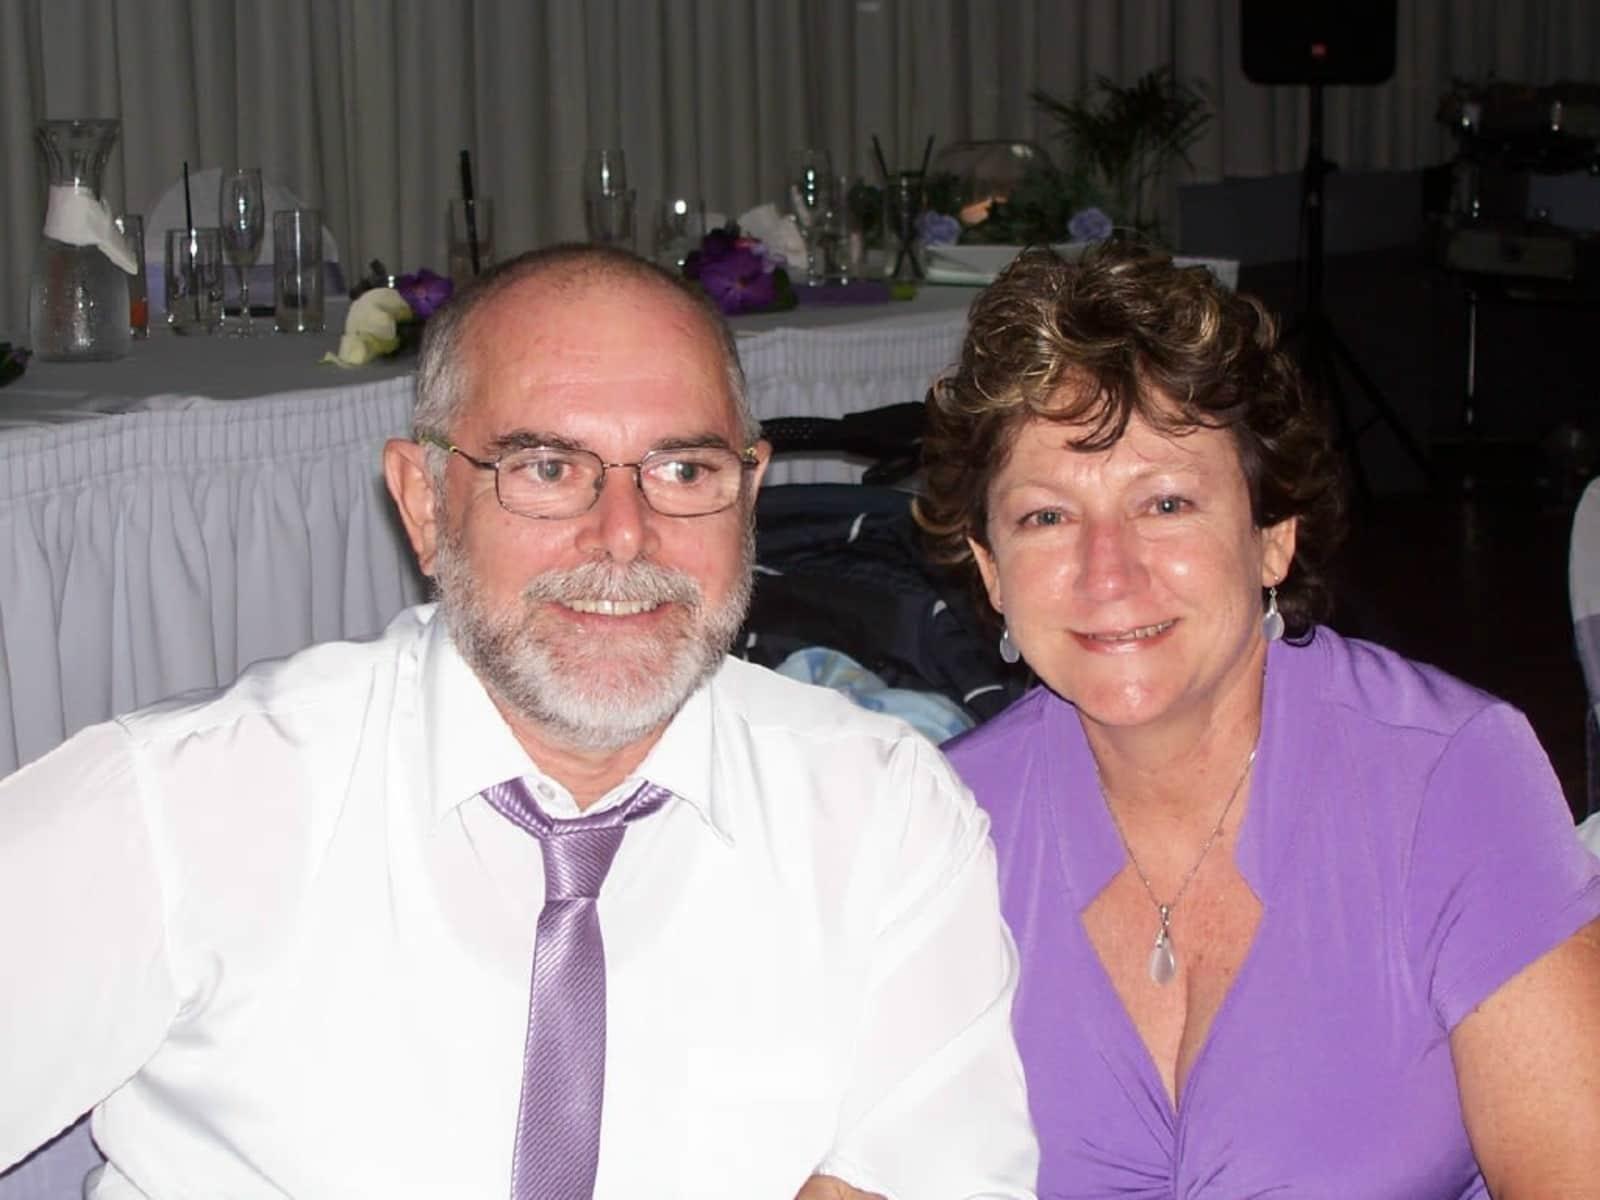 Rachelle & Ian frederick from Mackay, Queensland, Australia